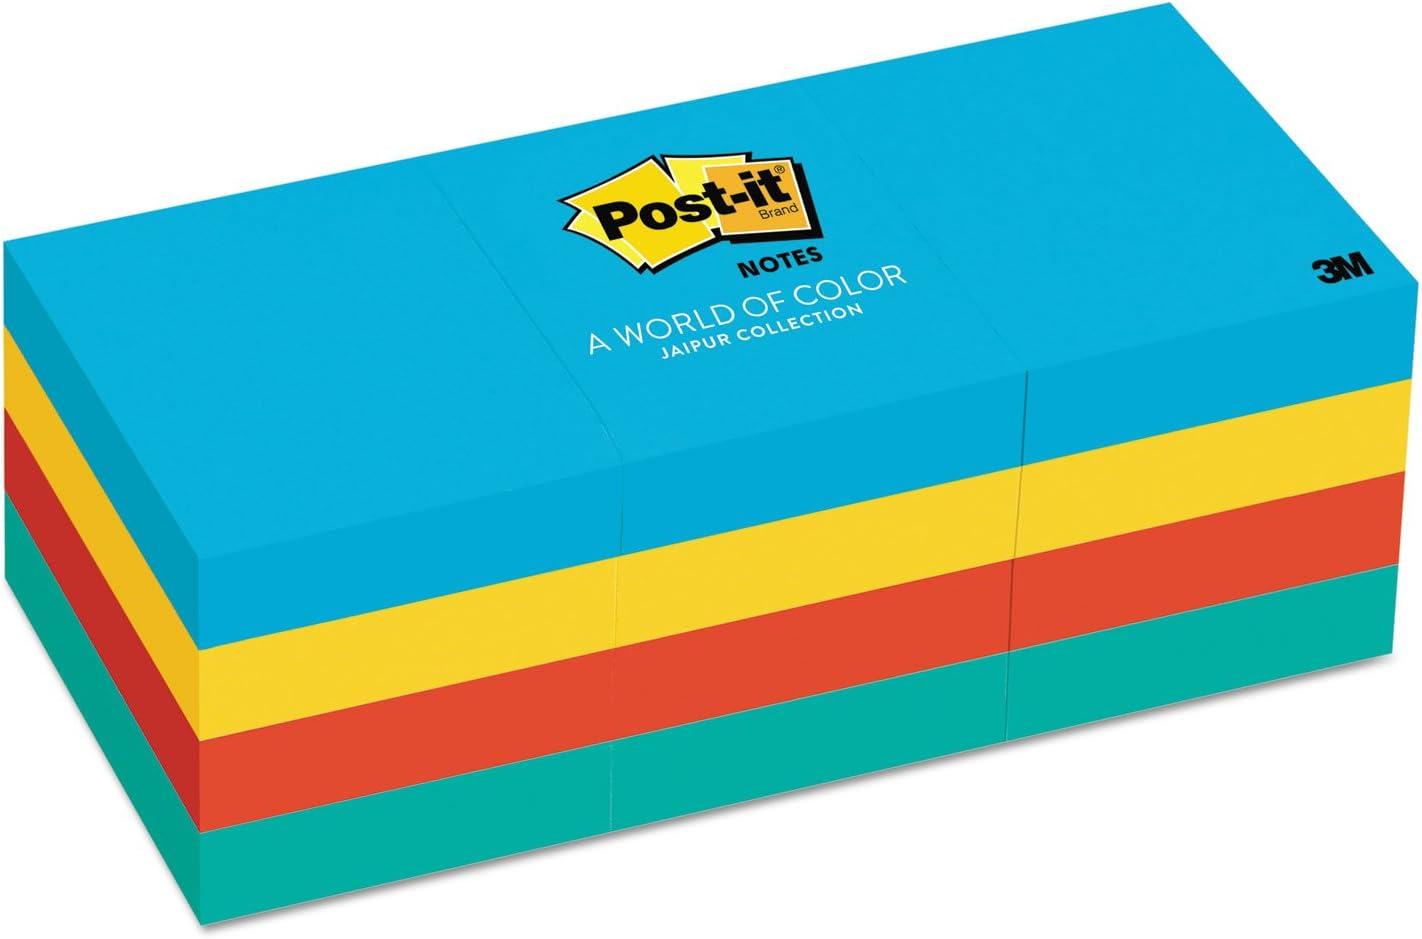 Post-it Notes Original Pads in Jaipur Colors 1.5 x 2 12 Pads//Pack